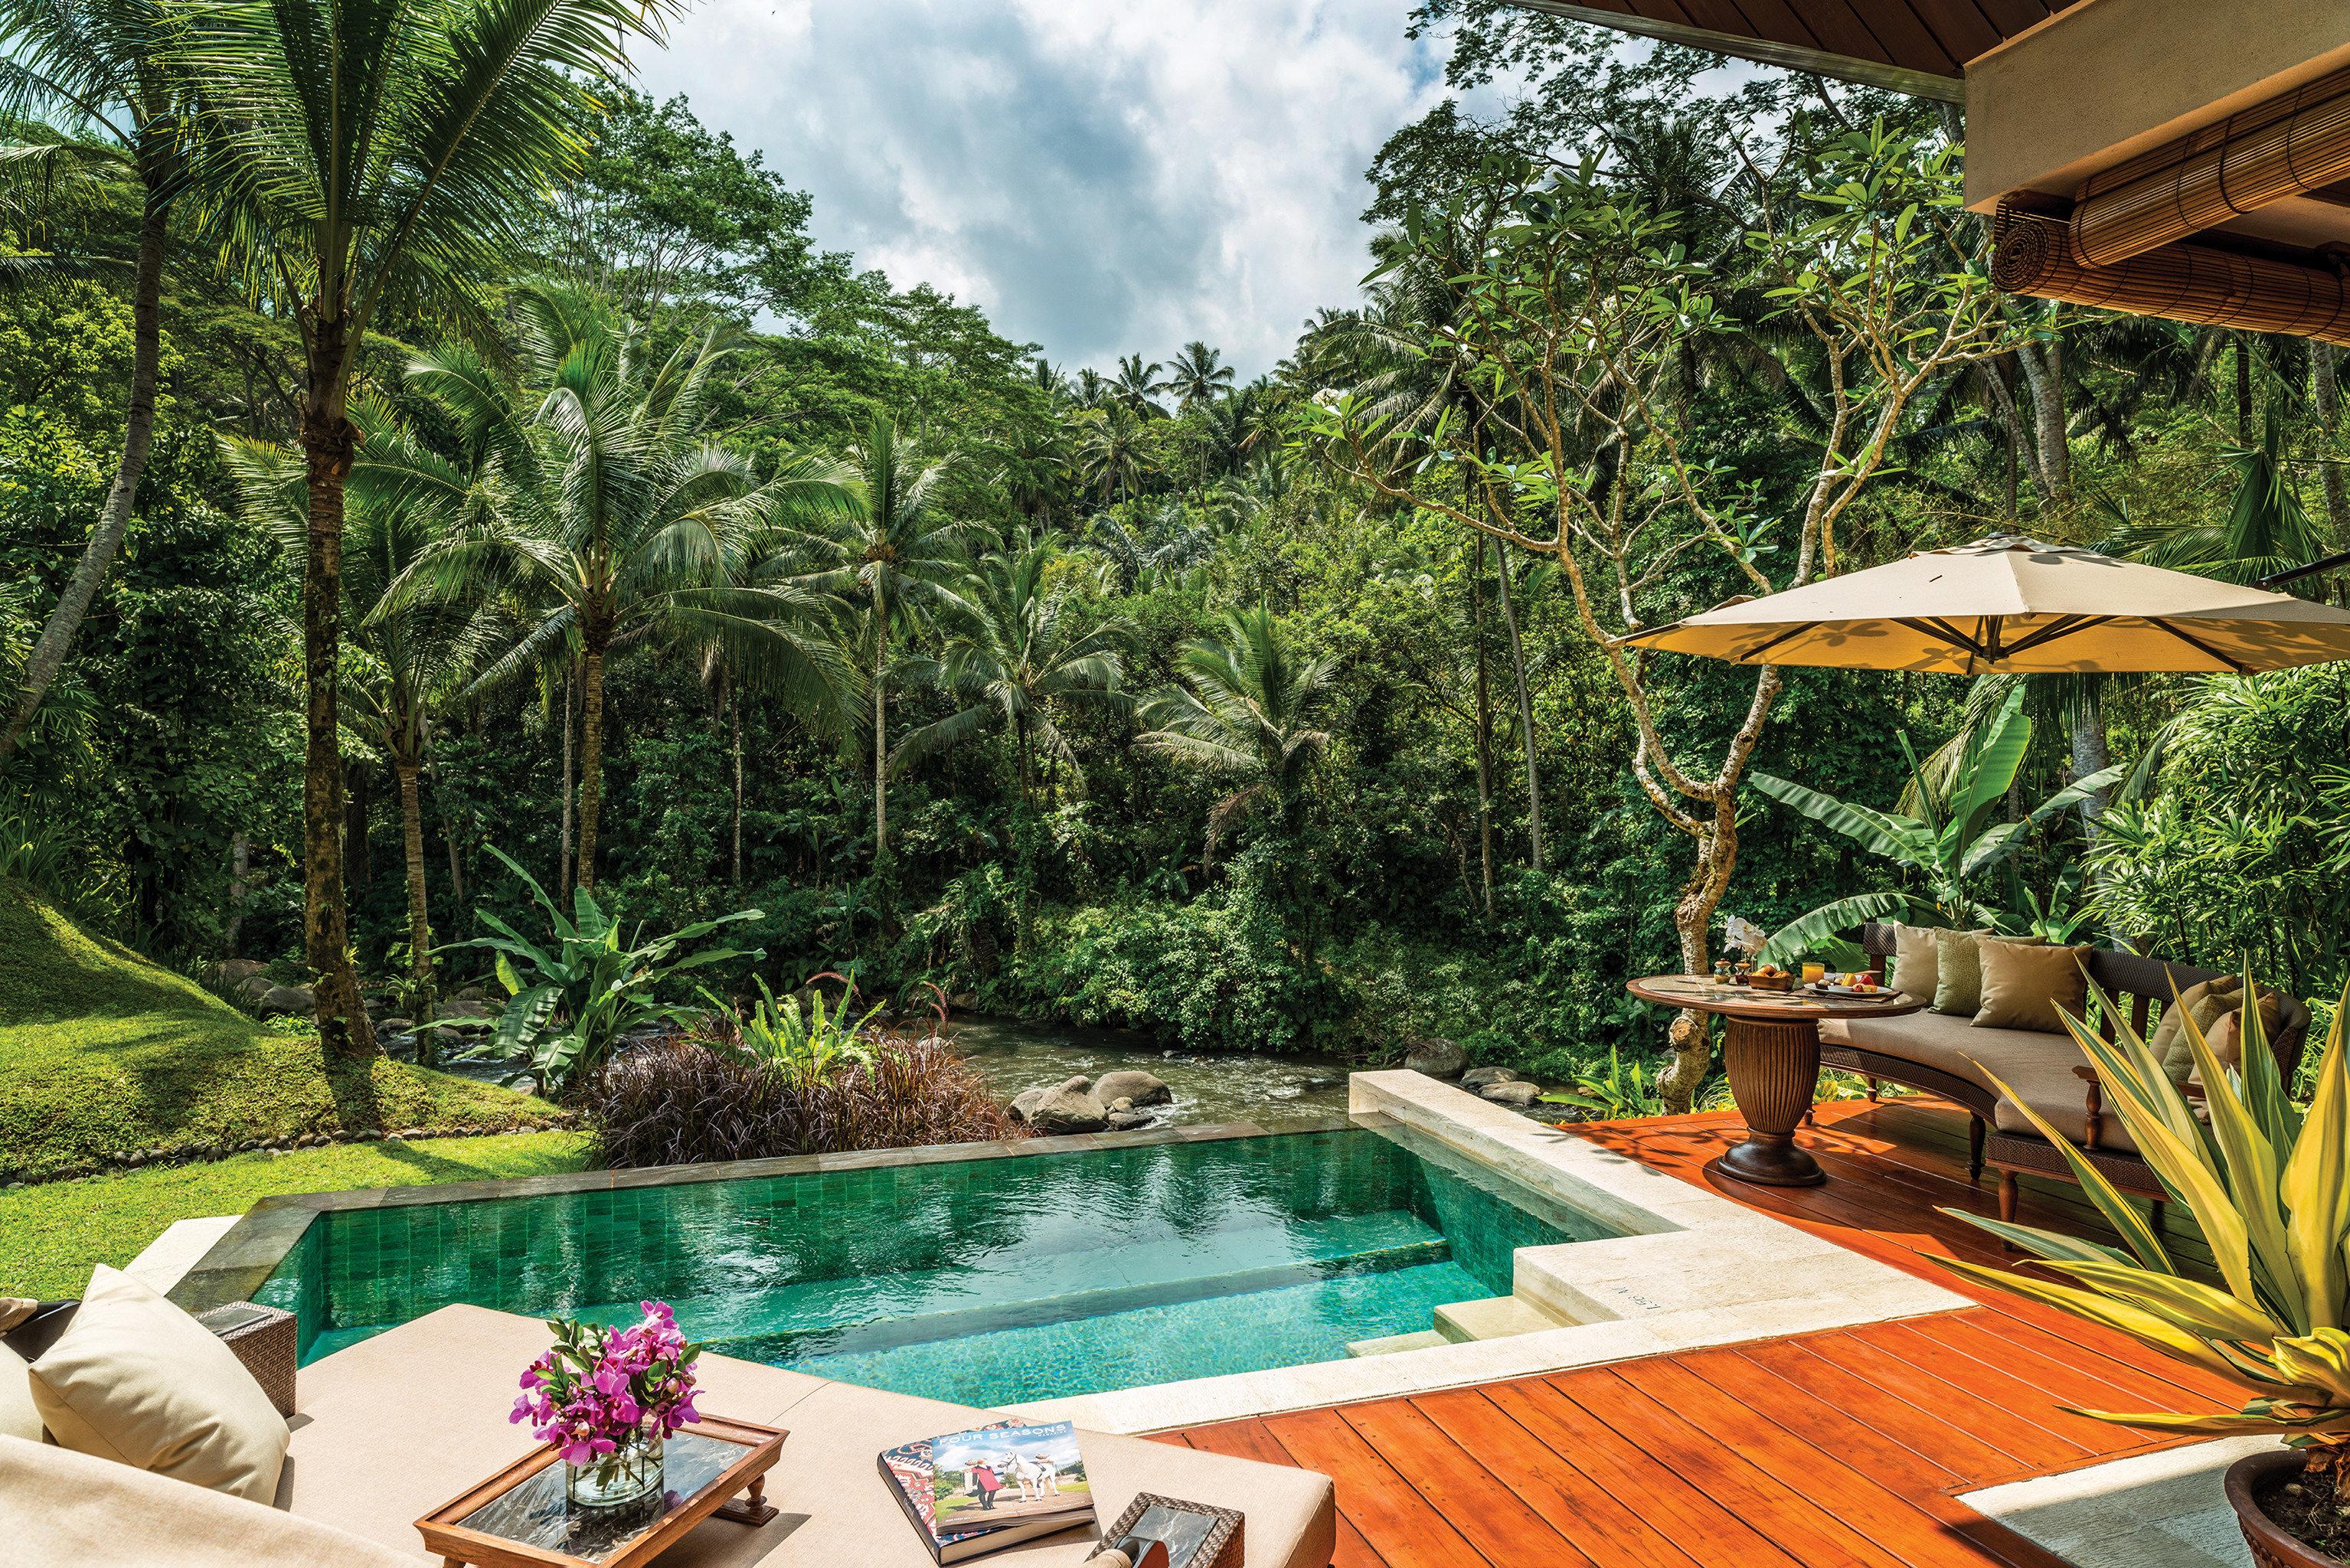 Honeymoon Jungle Luxury Offbeat Pool Romance Trip Ideas tree swimming pool property Resort backyard Villa eco hotel Garden colorful